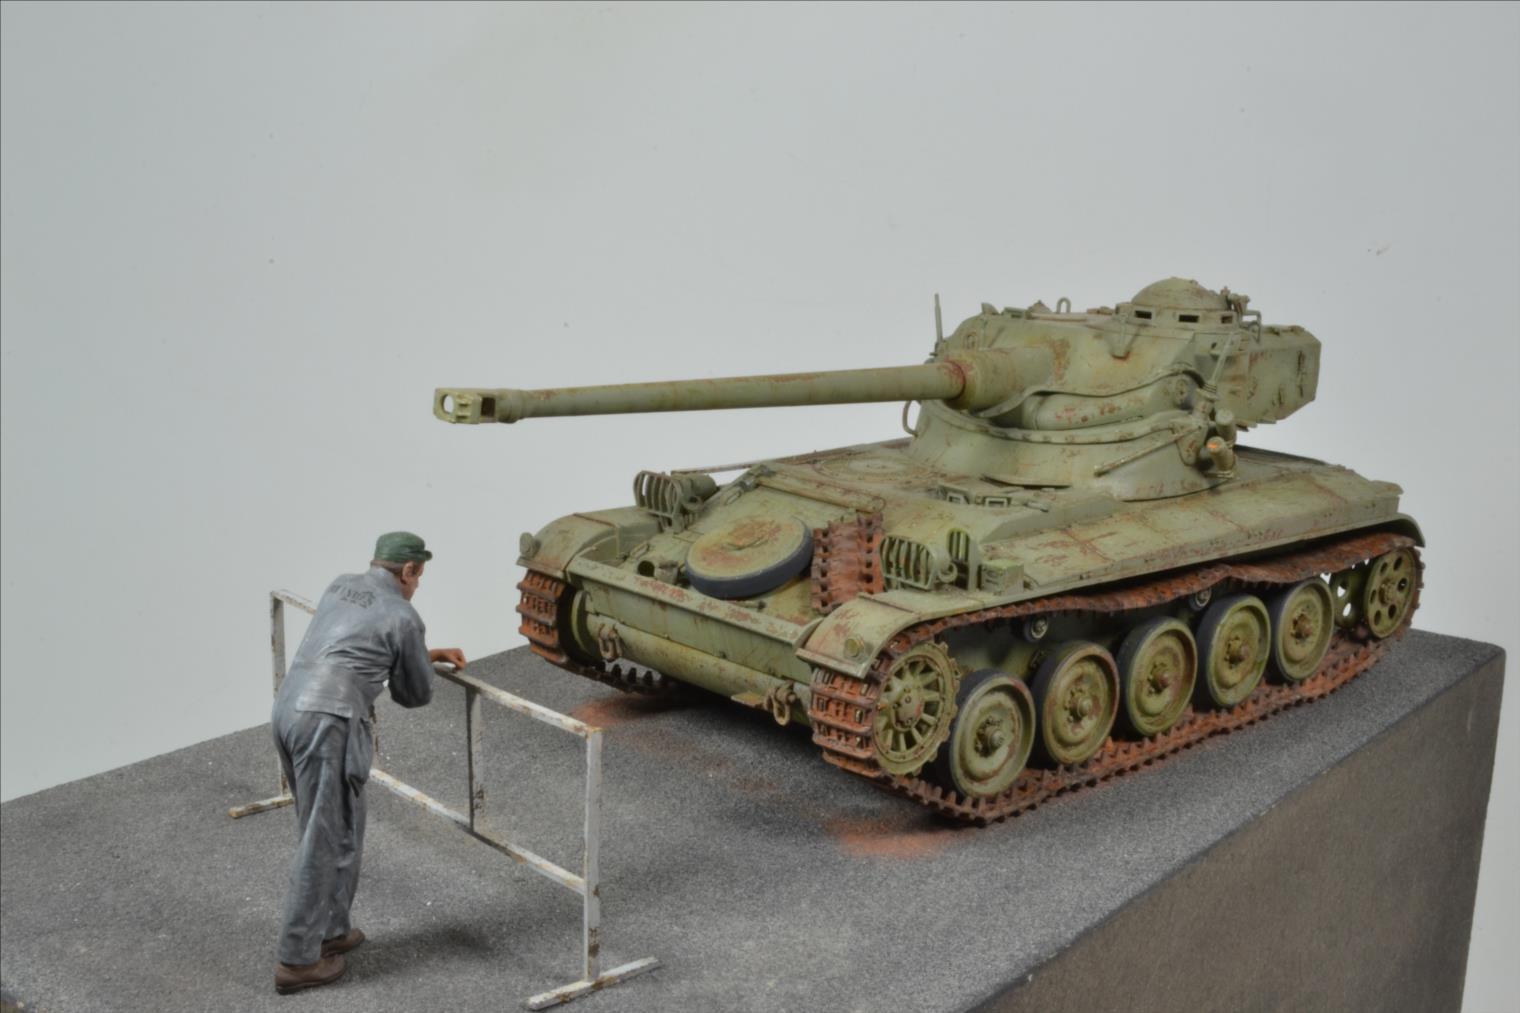 AMX 13 (Tamiya) 1/35 - Page 2 19061210391722494216272083